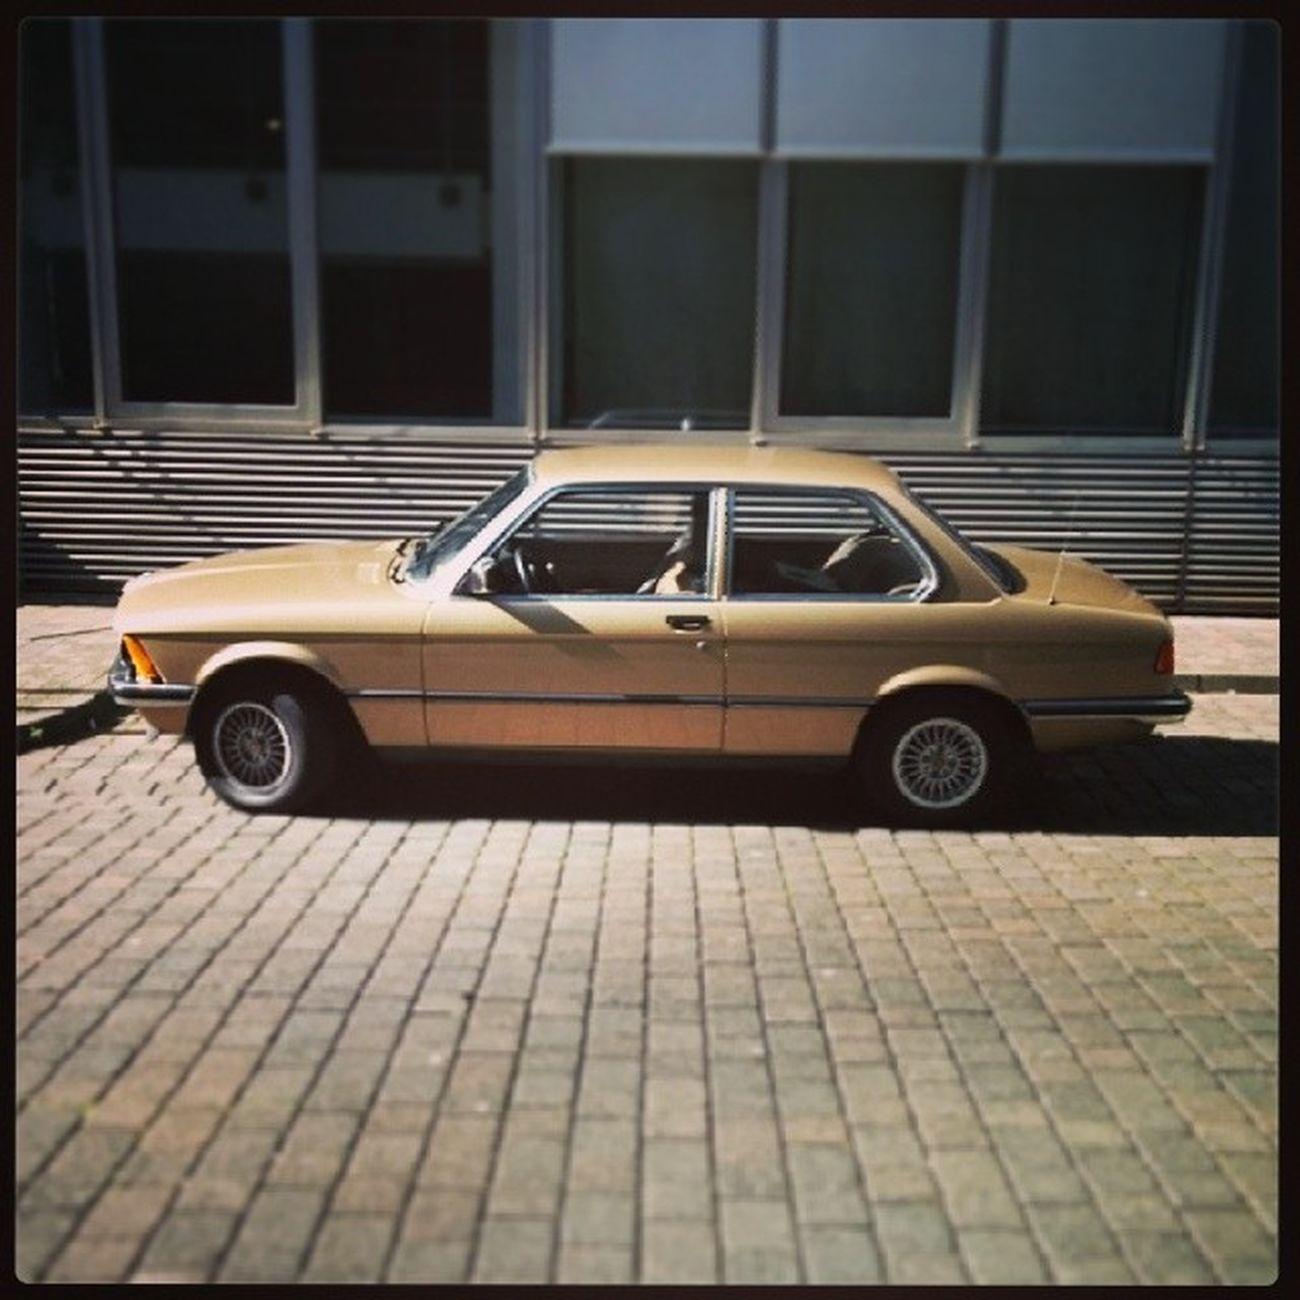 BMW Altekarrenbattle Oldtimer Gold Bmw Düsseldorf